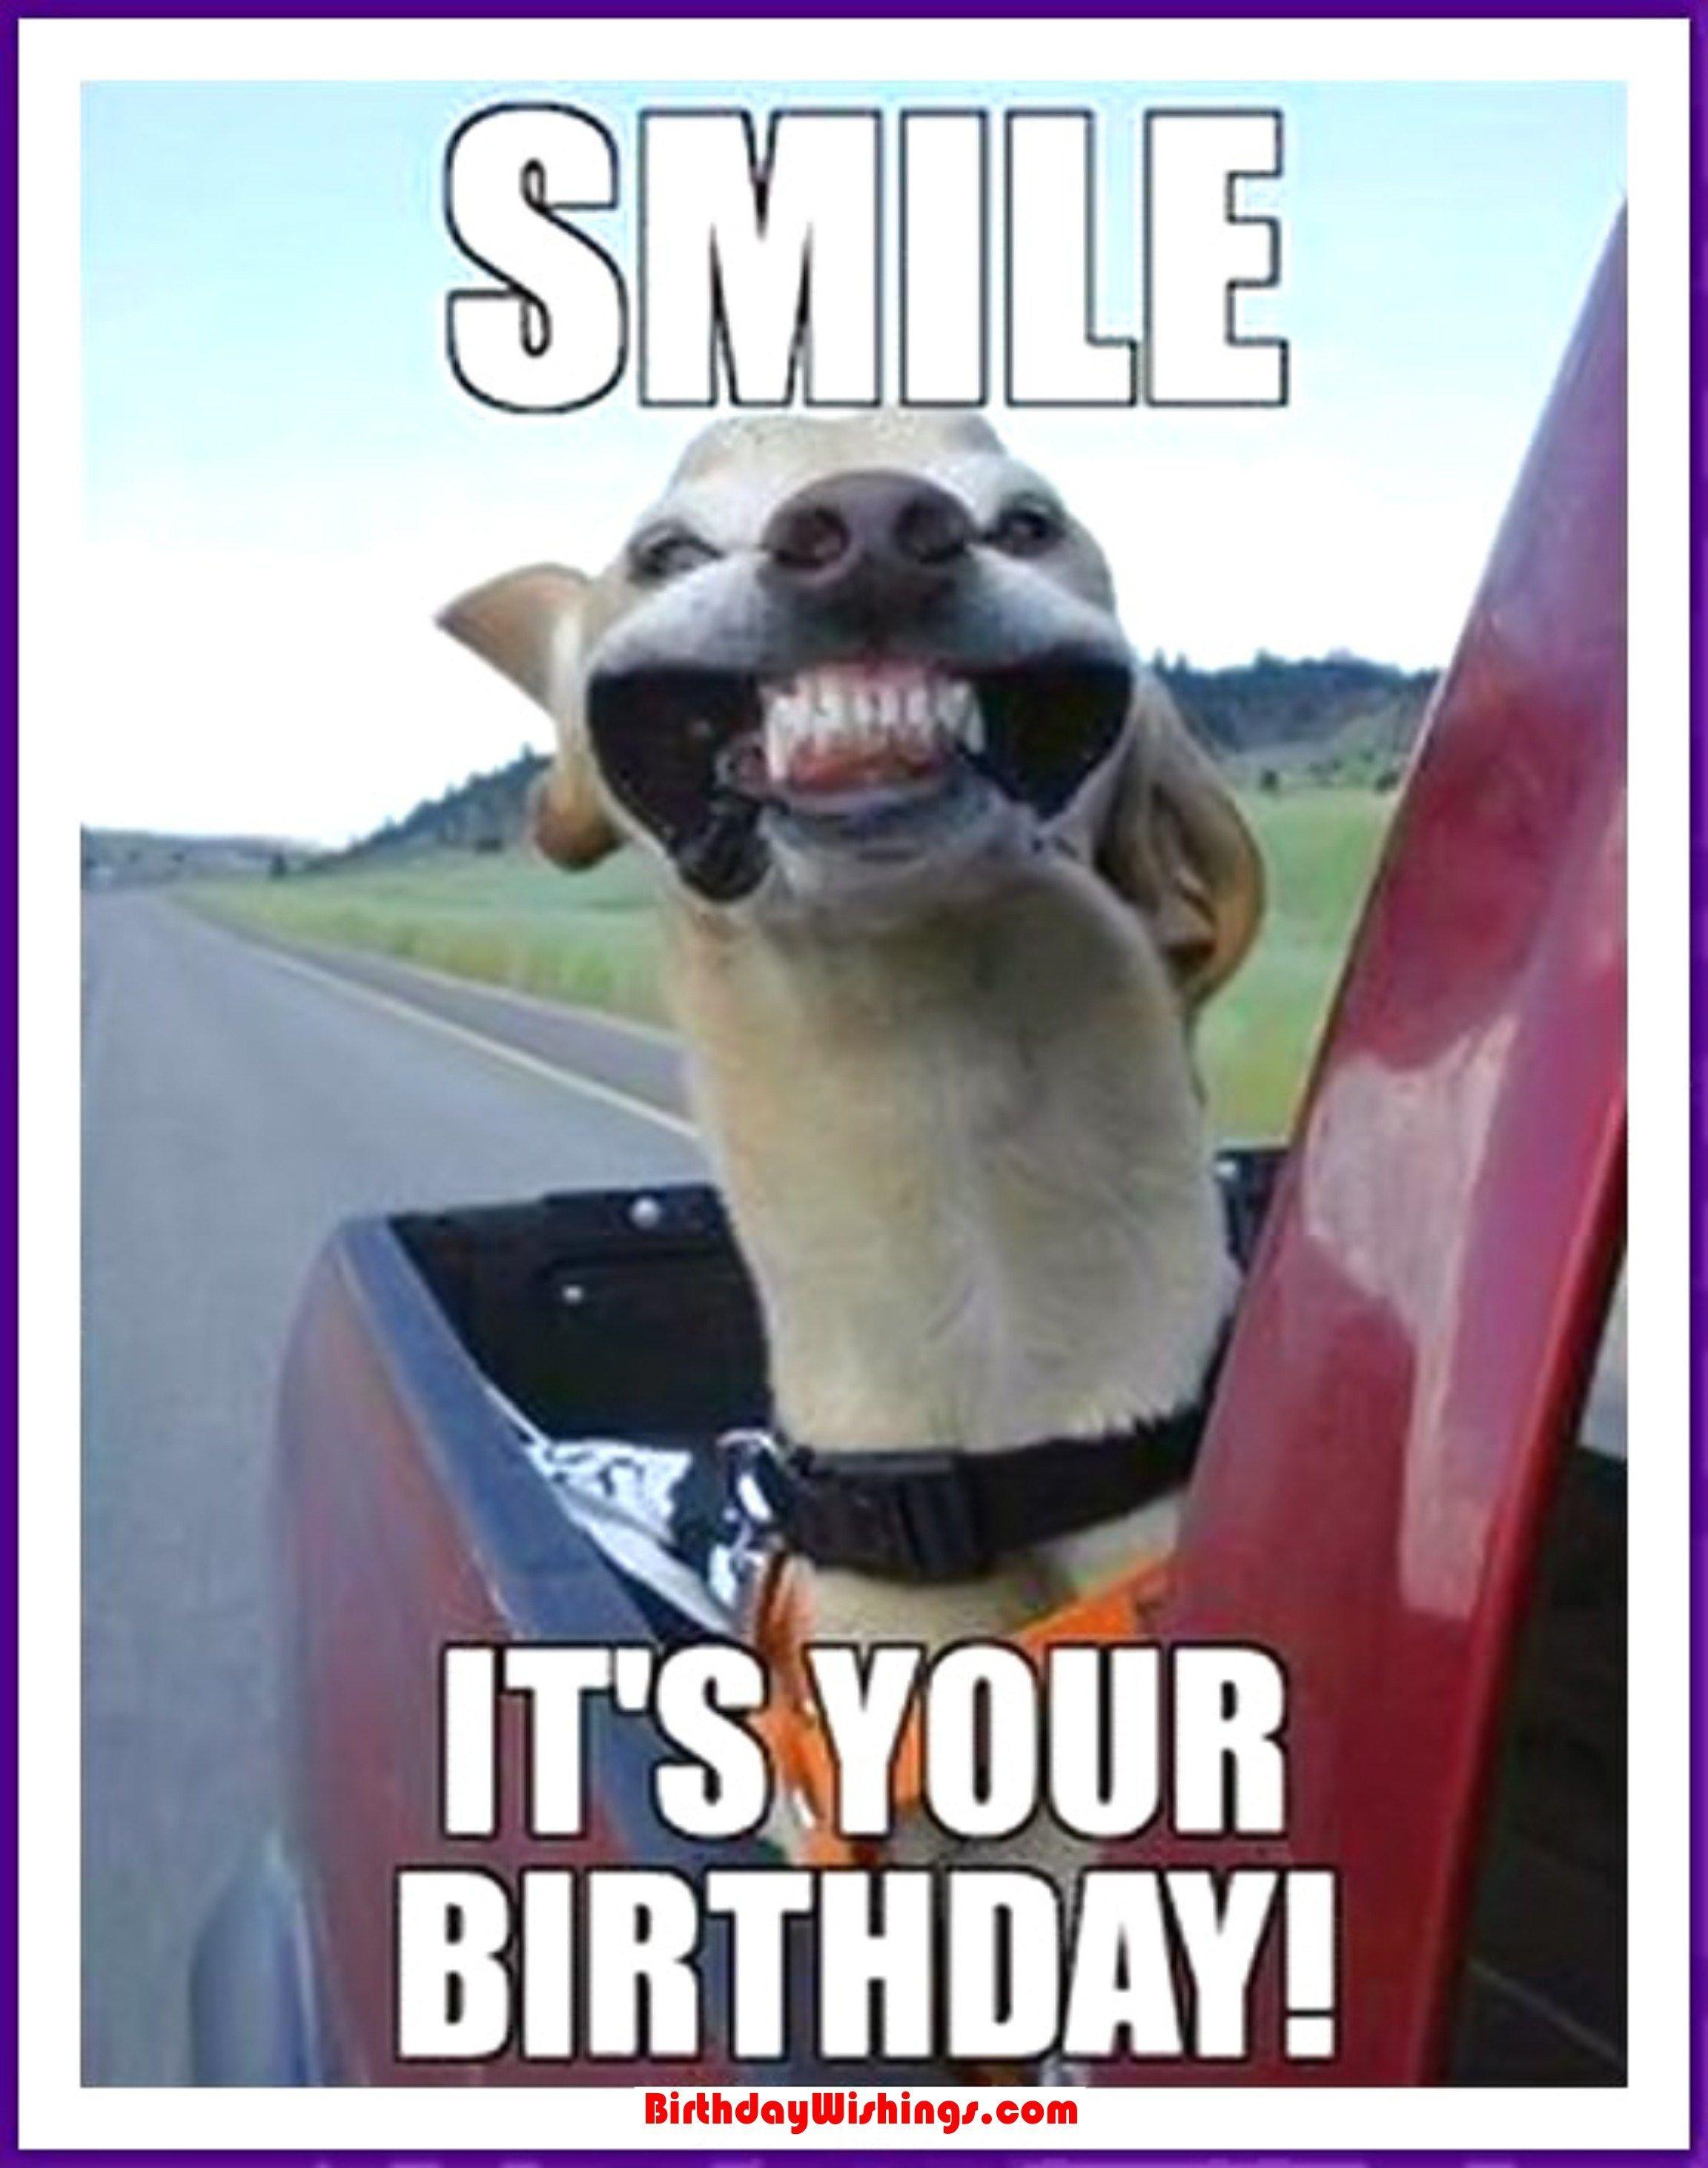 Funny Happy Birthday Photo  Funny Happy Birthday Memes With cats Dogs & Funny Animals